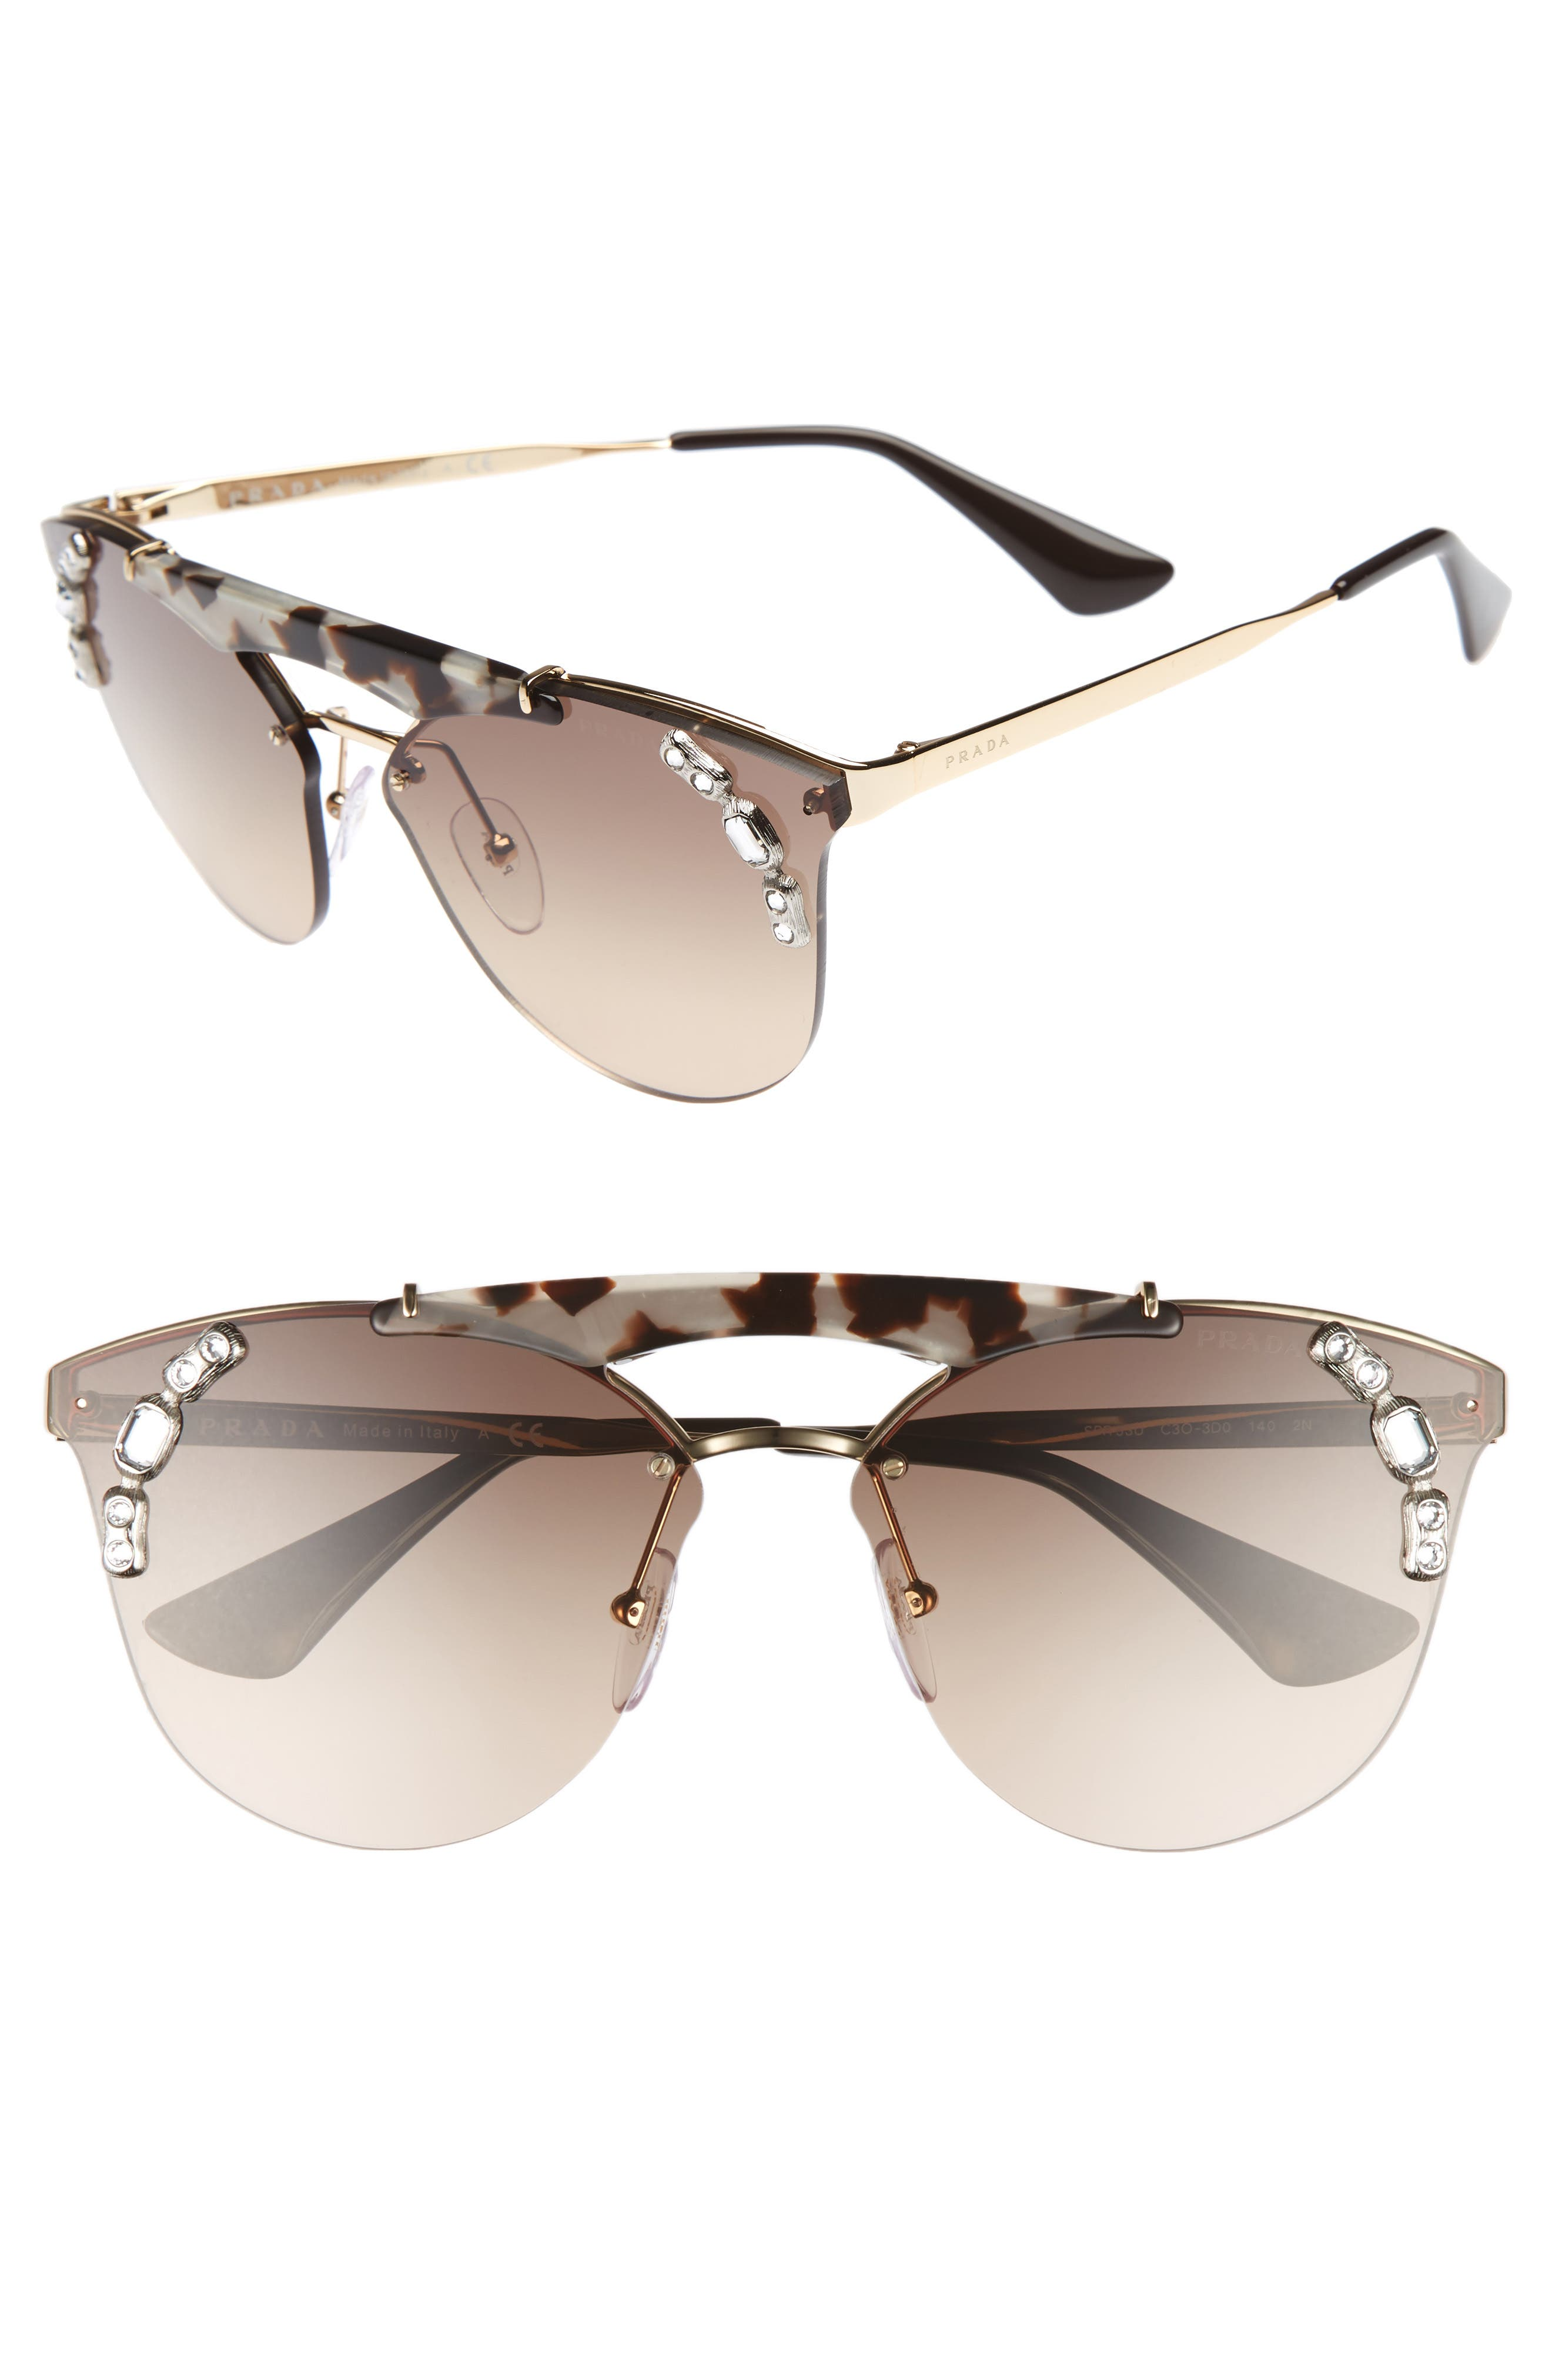 @ Prada 53mm Embellished Rimless Sunglasses